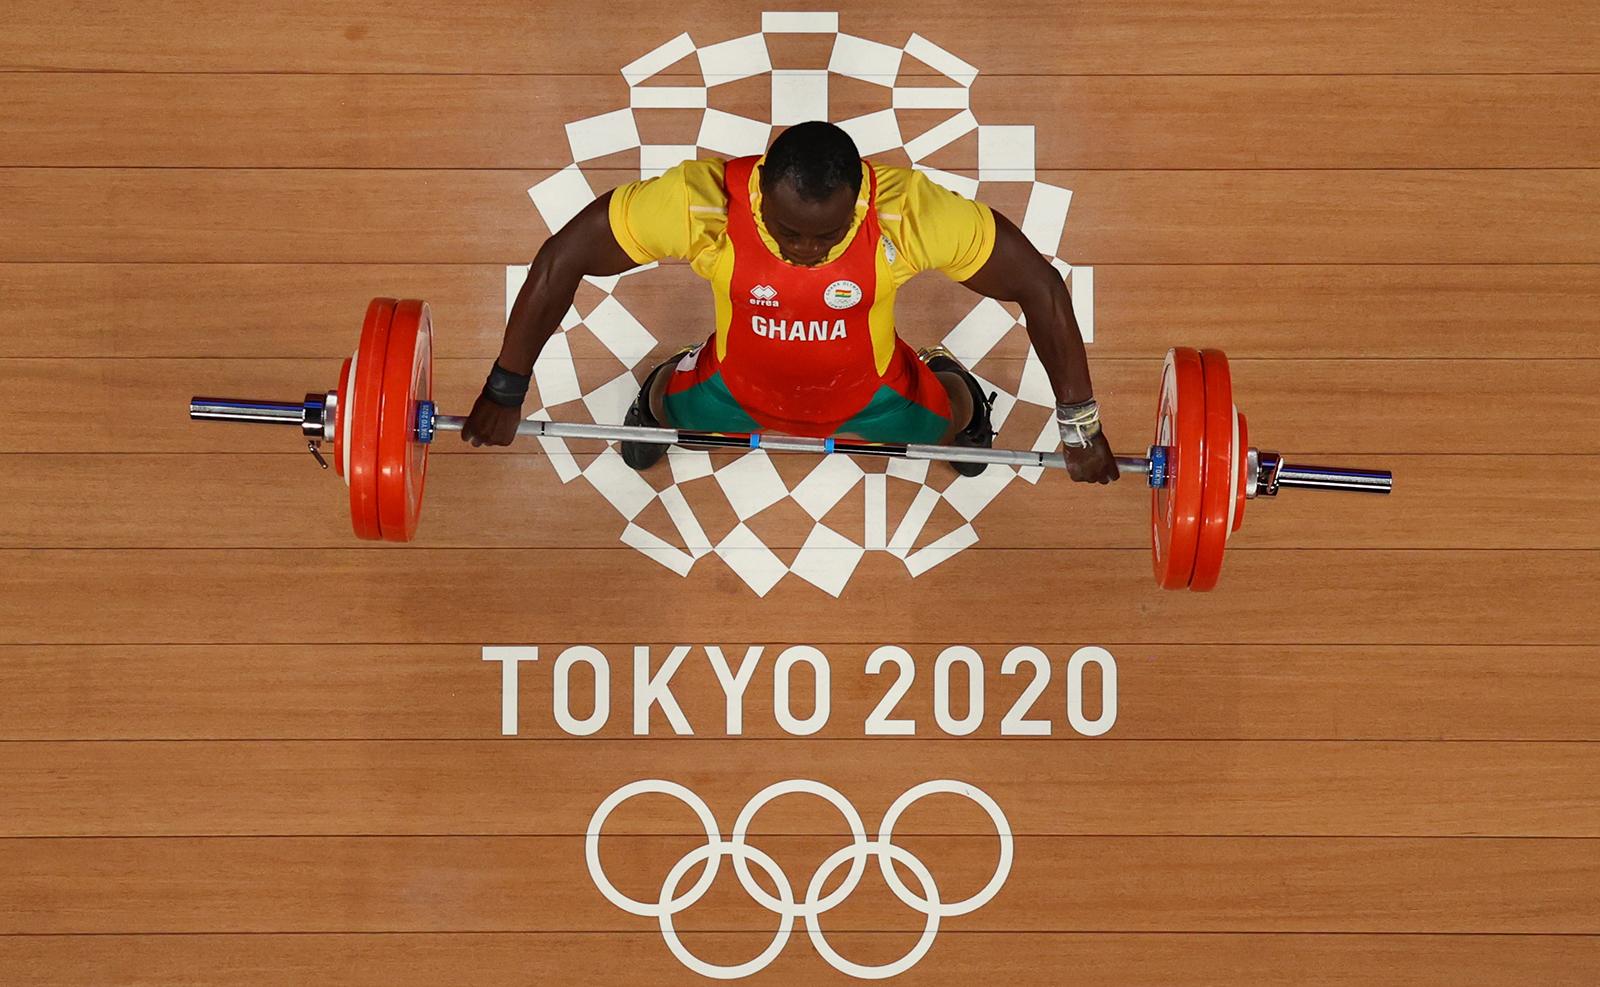 Tokyo 2020 Olympics - Weightlifting - Men's 96kg - Group B - Tokyo International Forum, Tokyo, Japan - July 31, 2021. Christian Amoah of Ghana in action. REUTERS